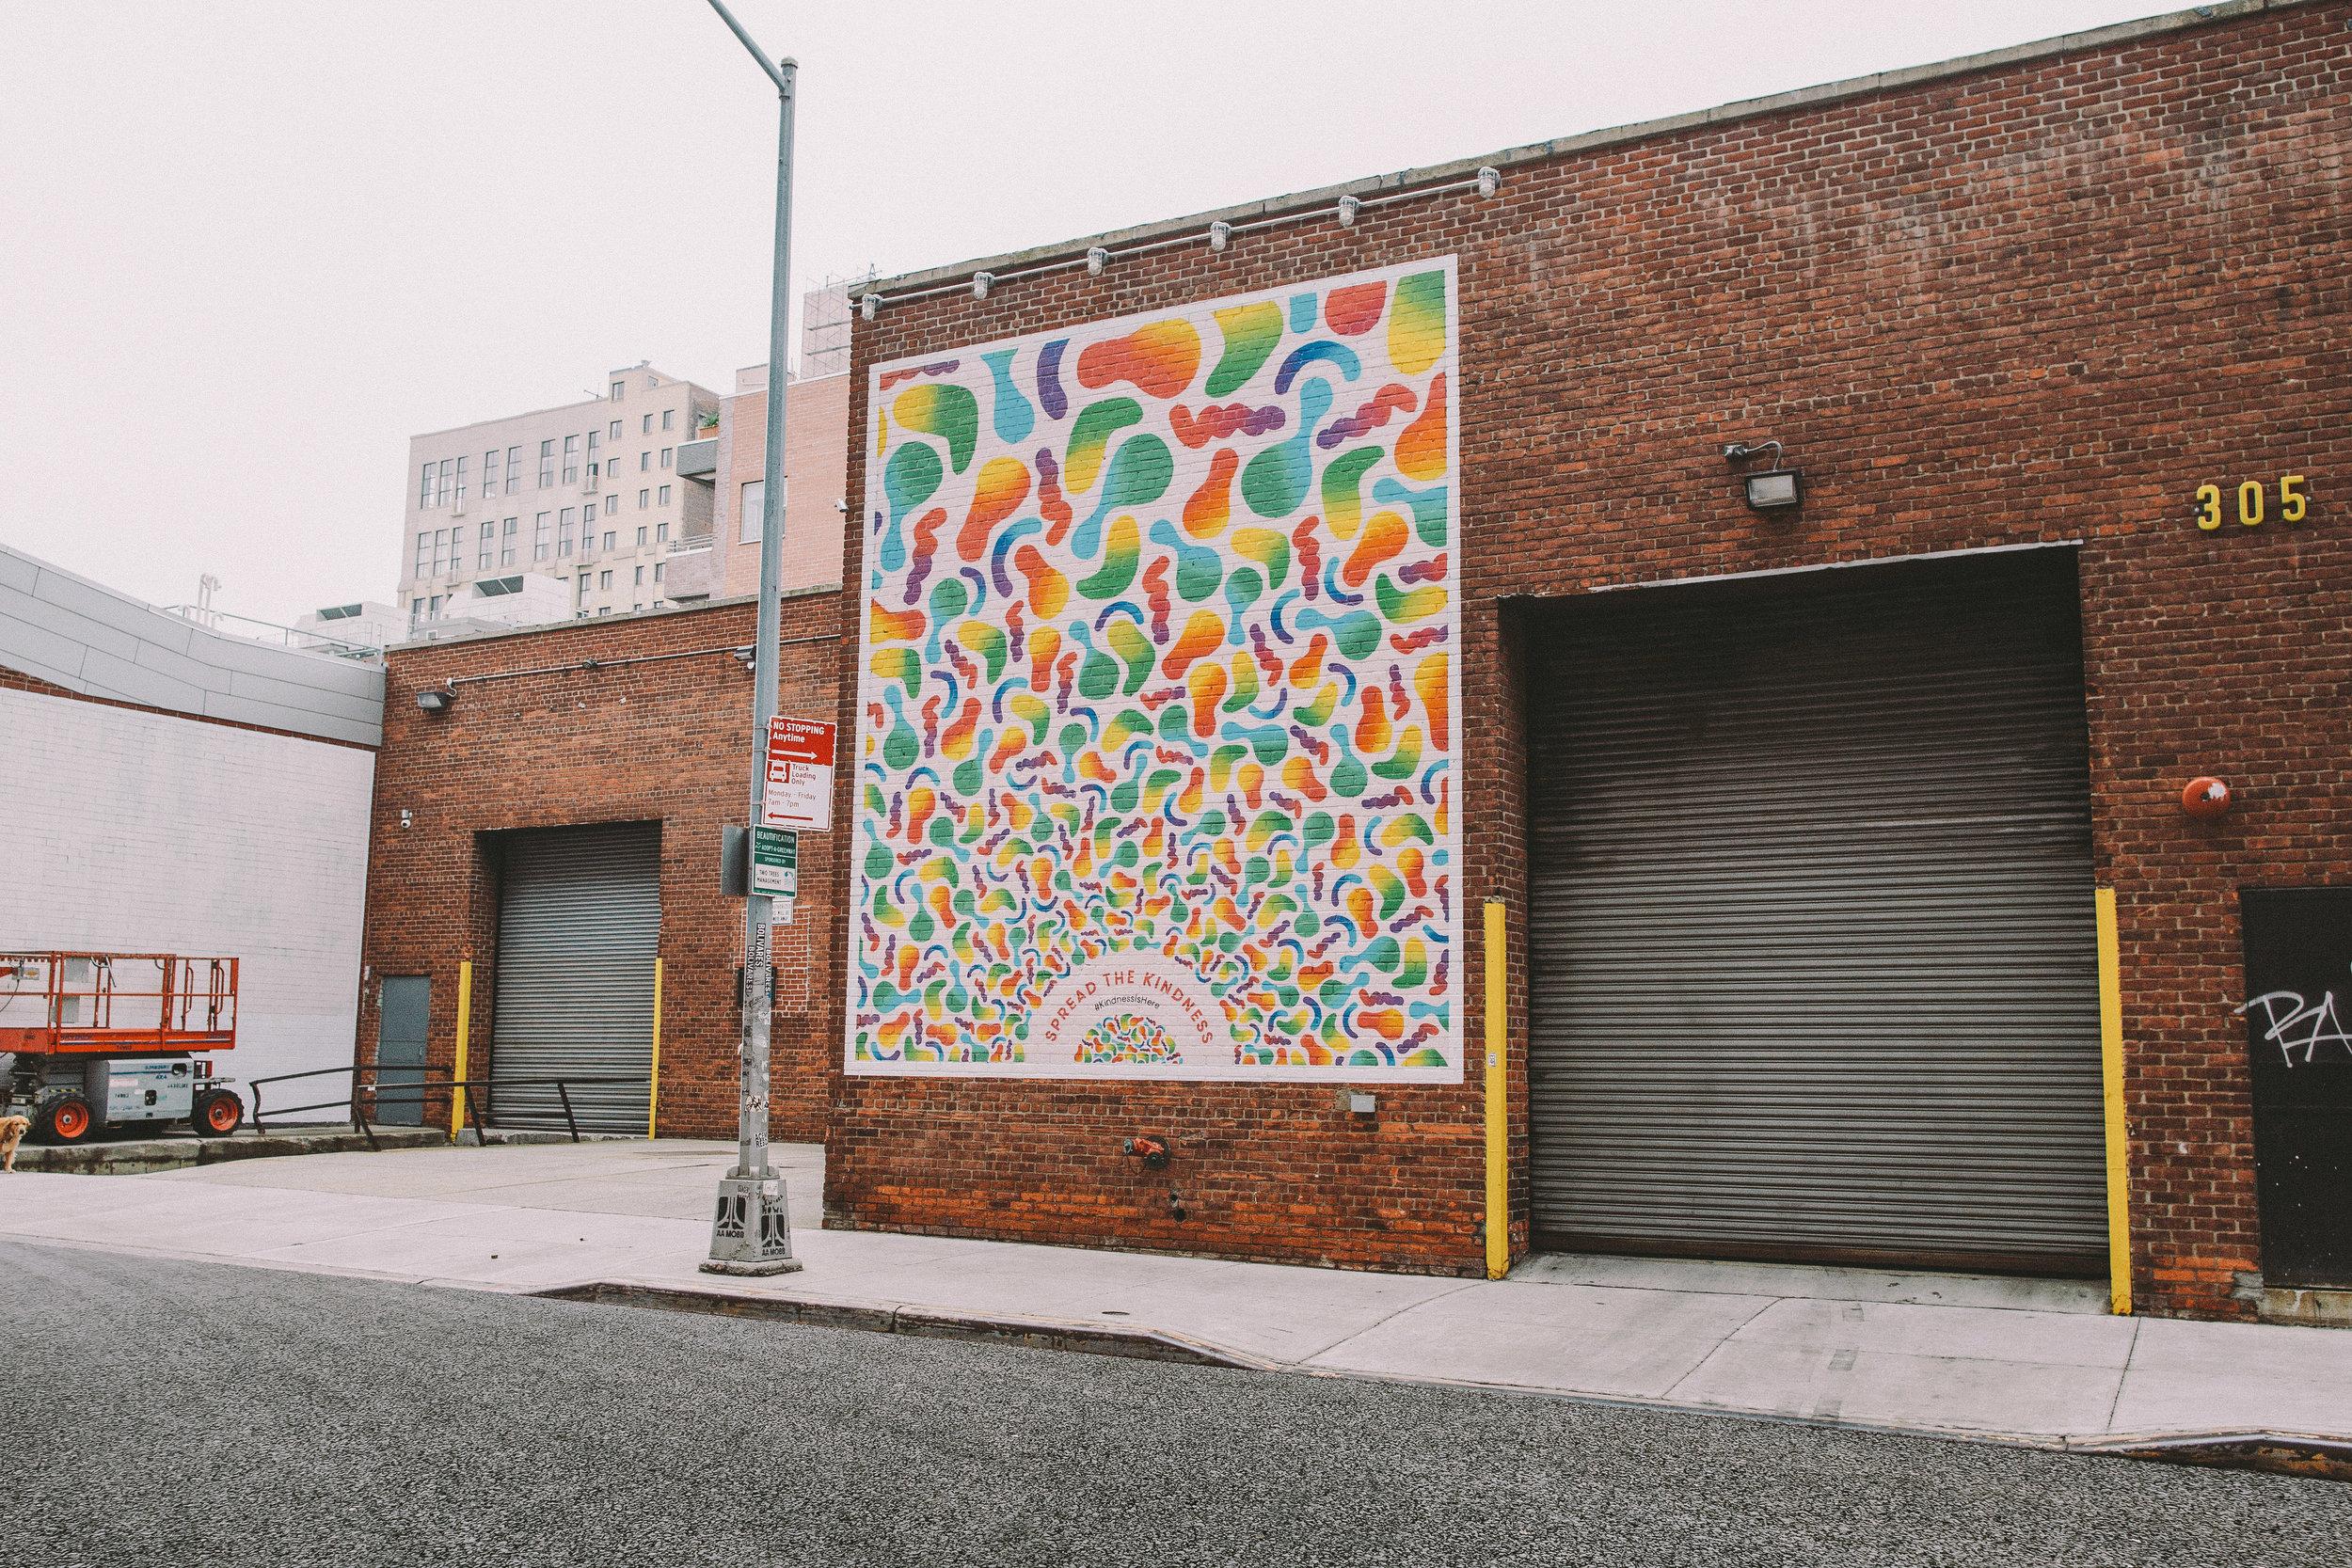 Mural in Williamsburg, Brooklyn